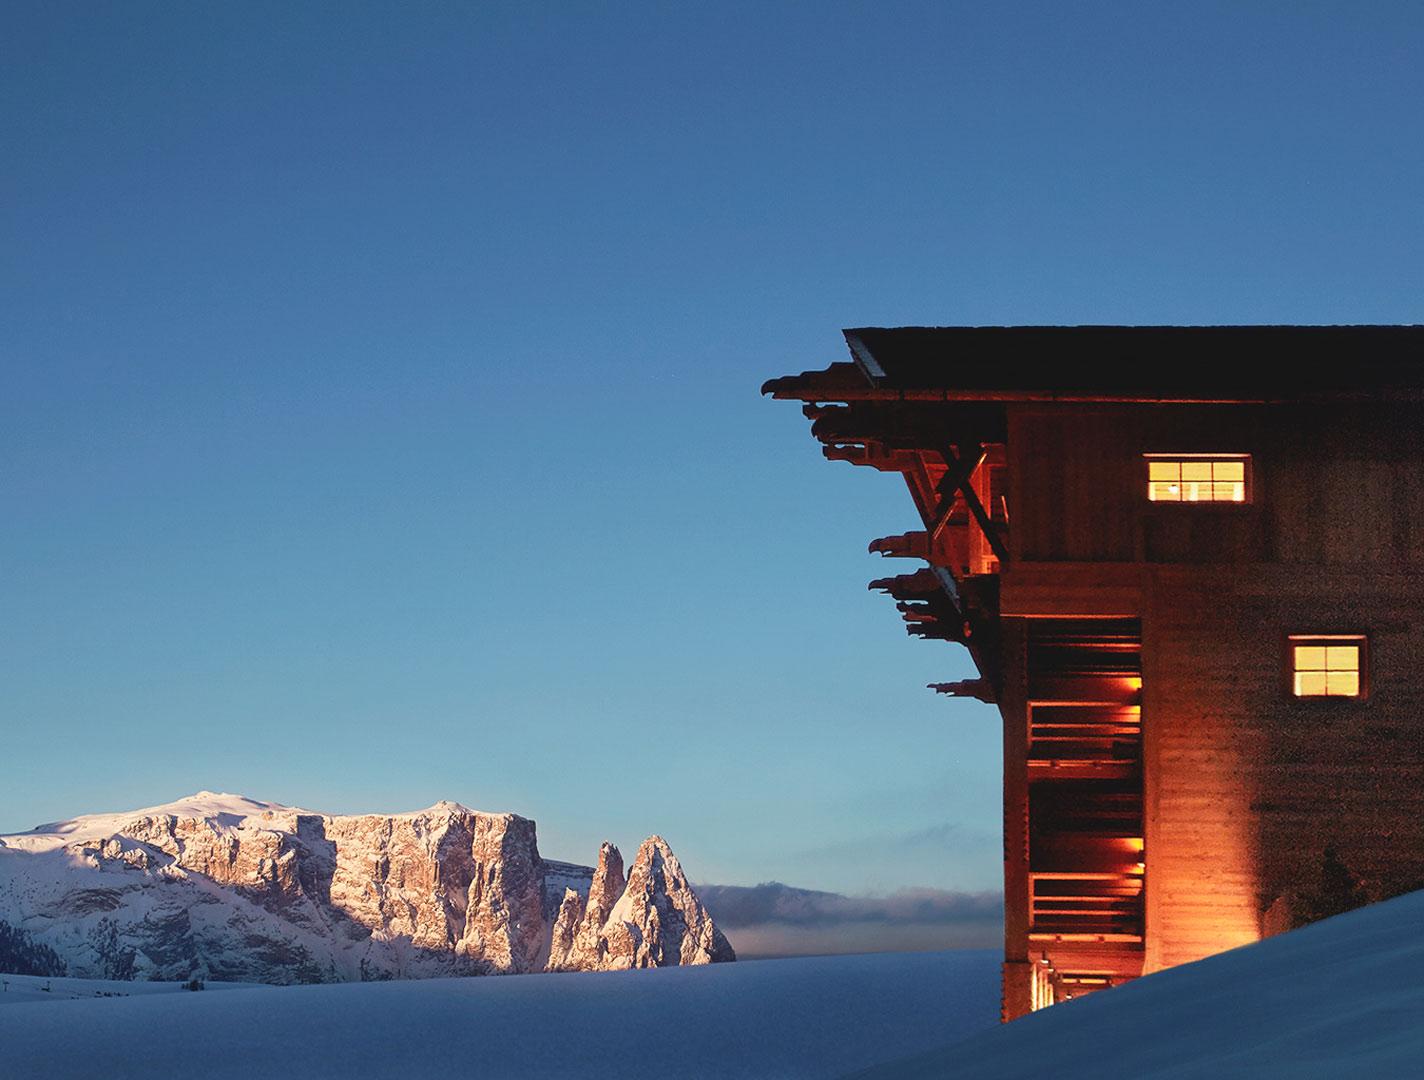 adlermountain-lodge-winter@2